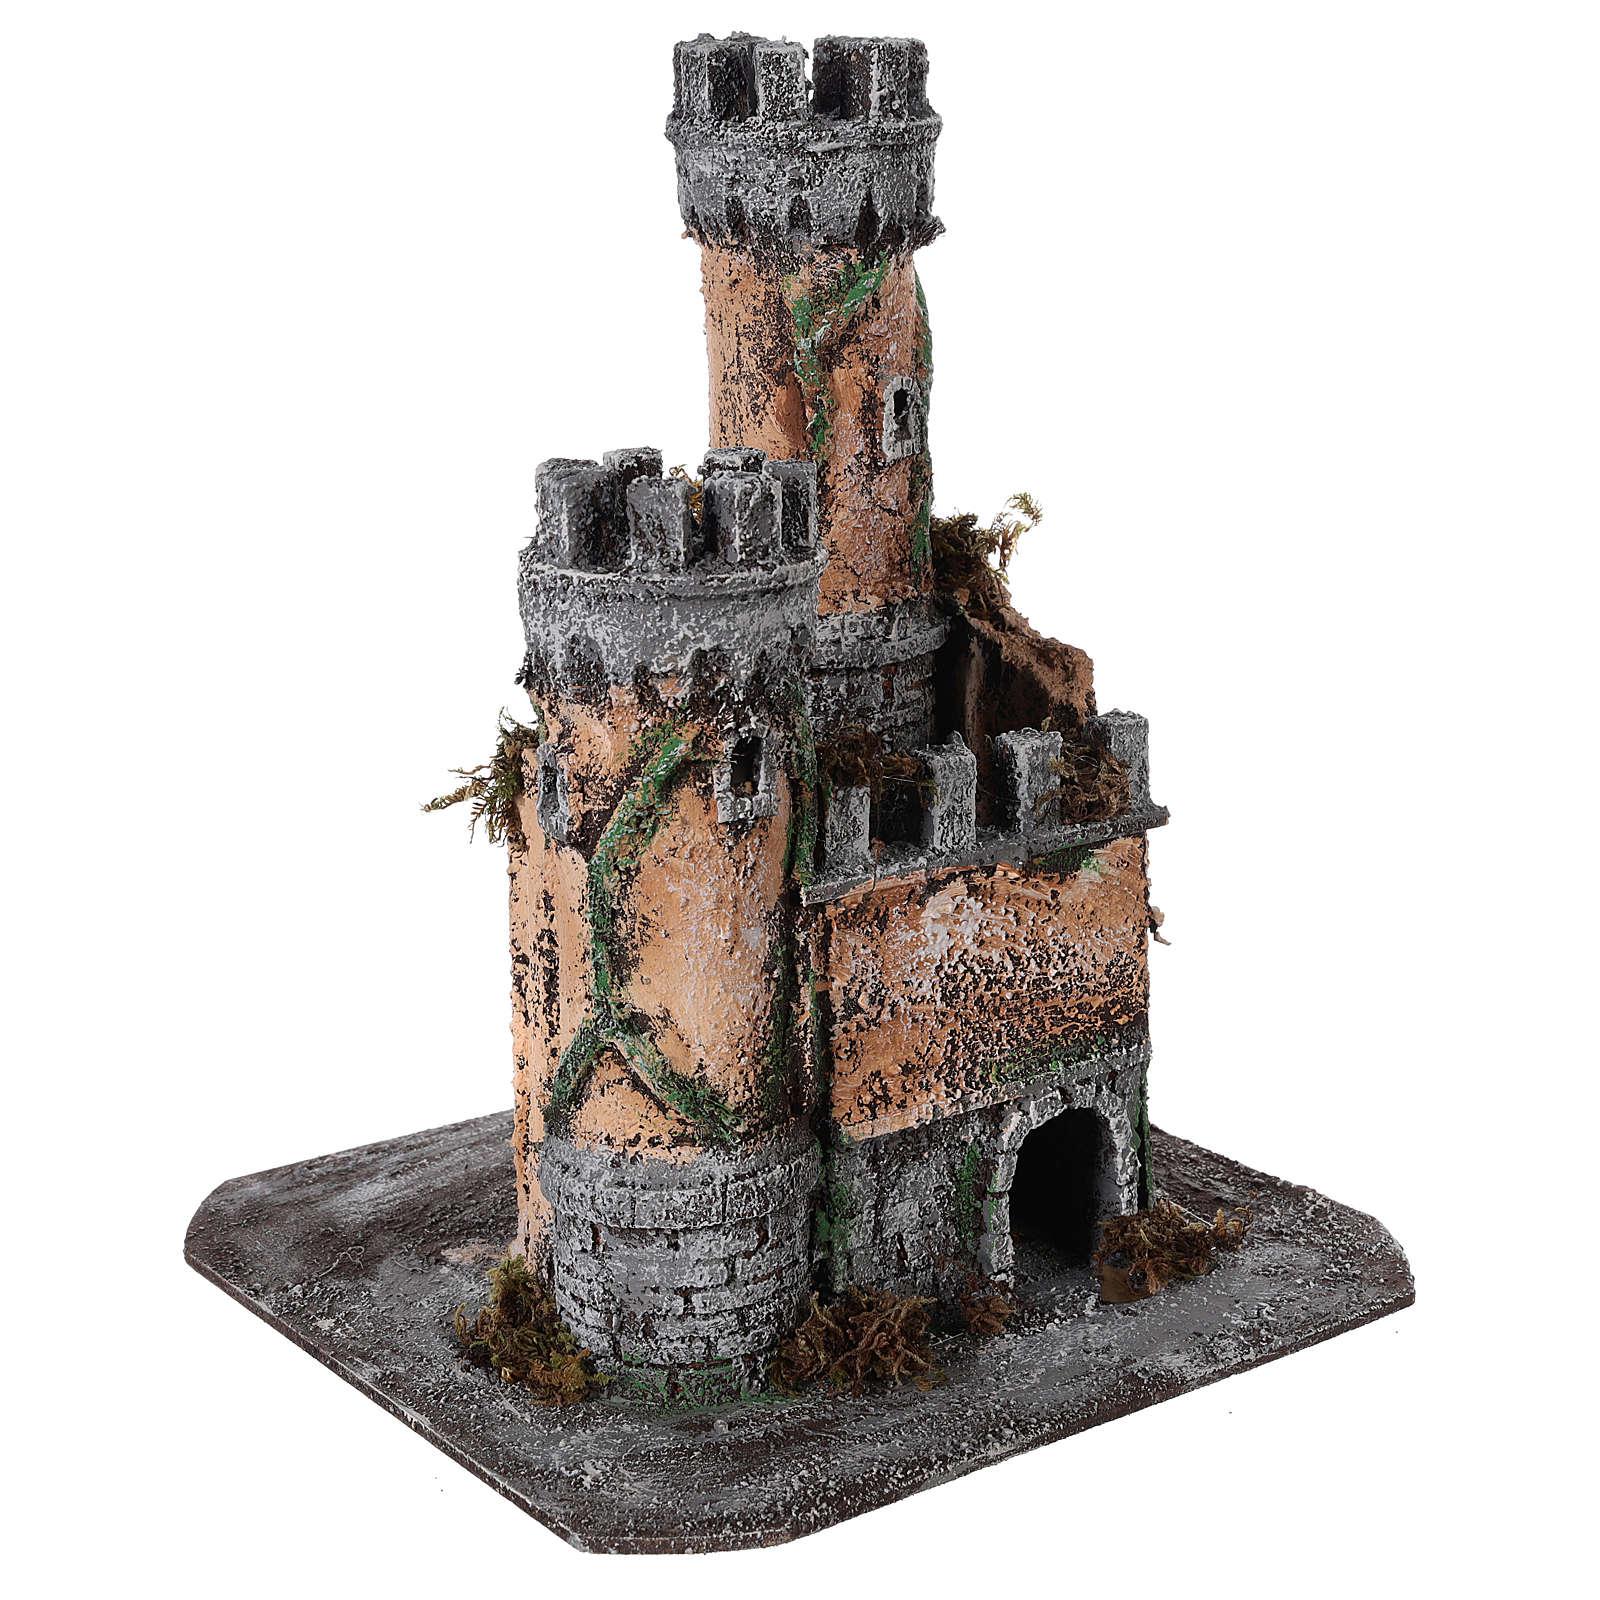 Castillo belén Nápoles corcho 30x26x26 cm 4